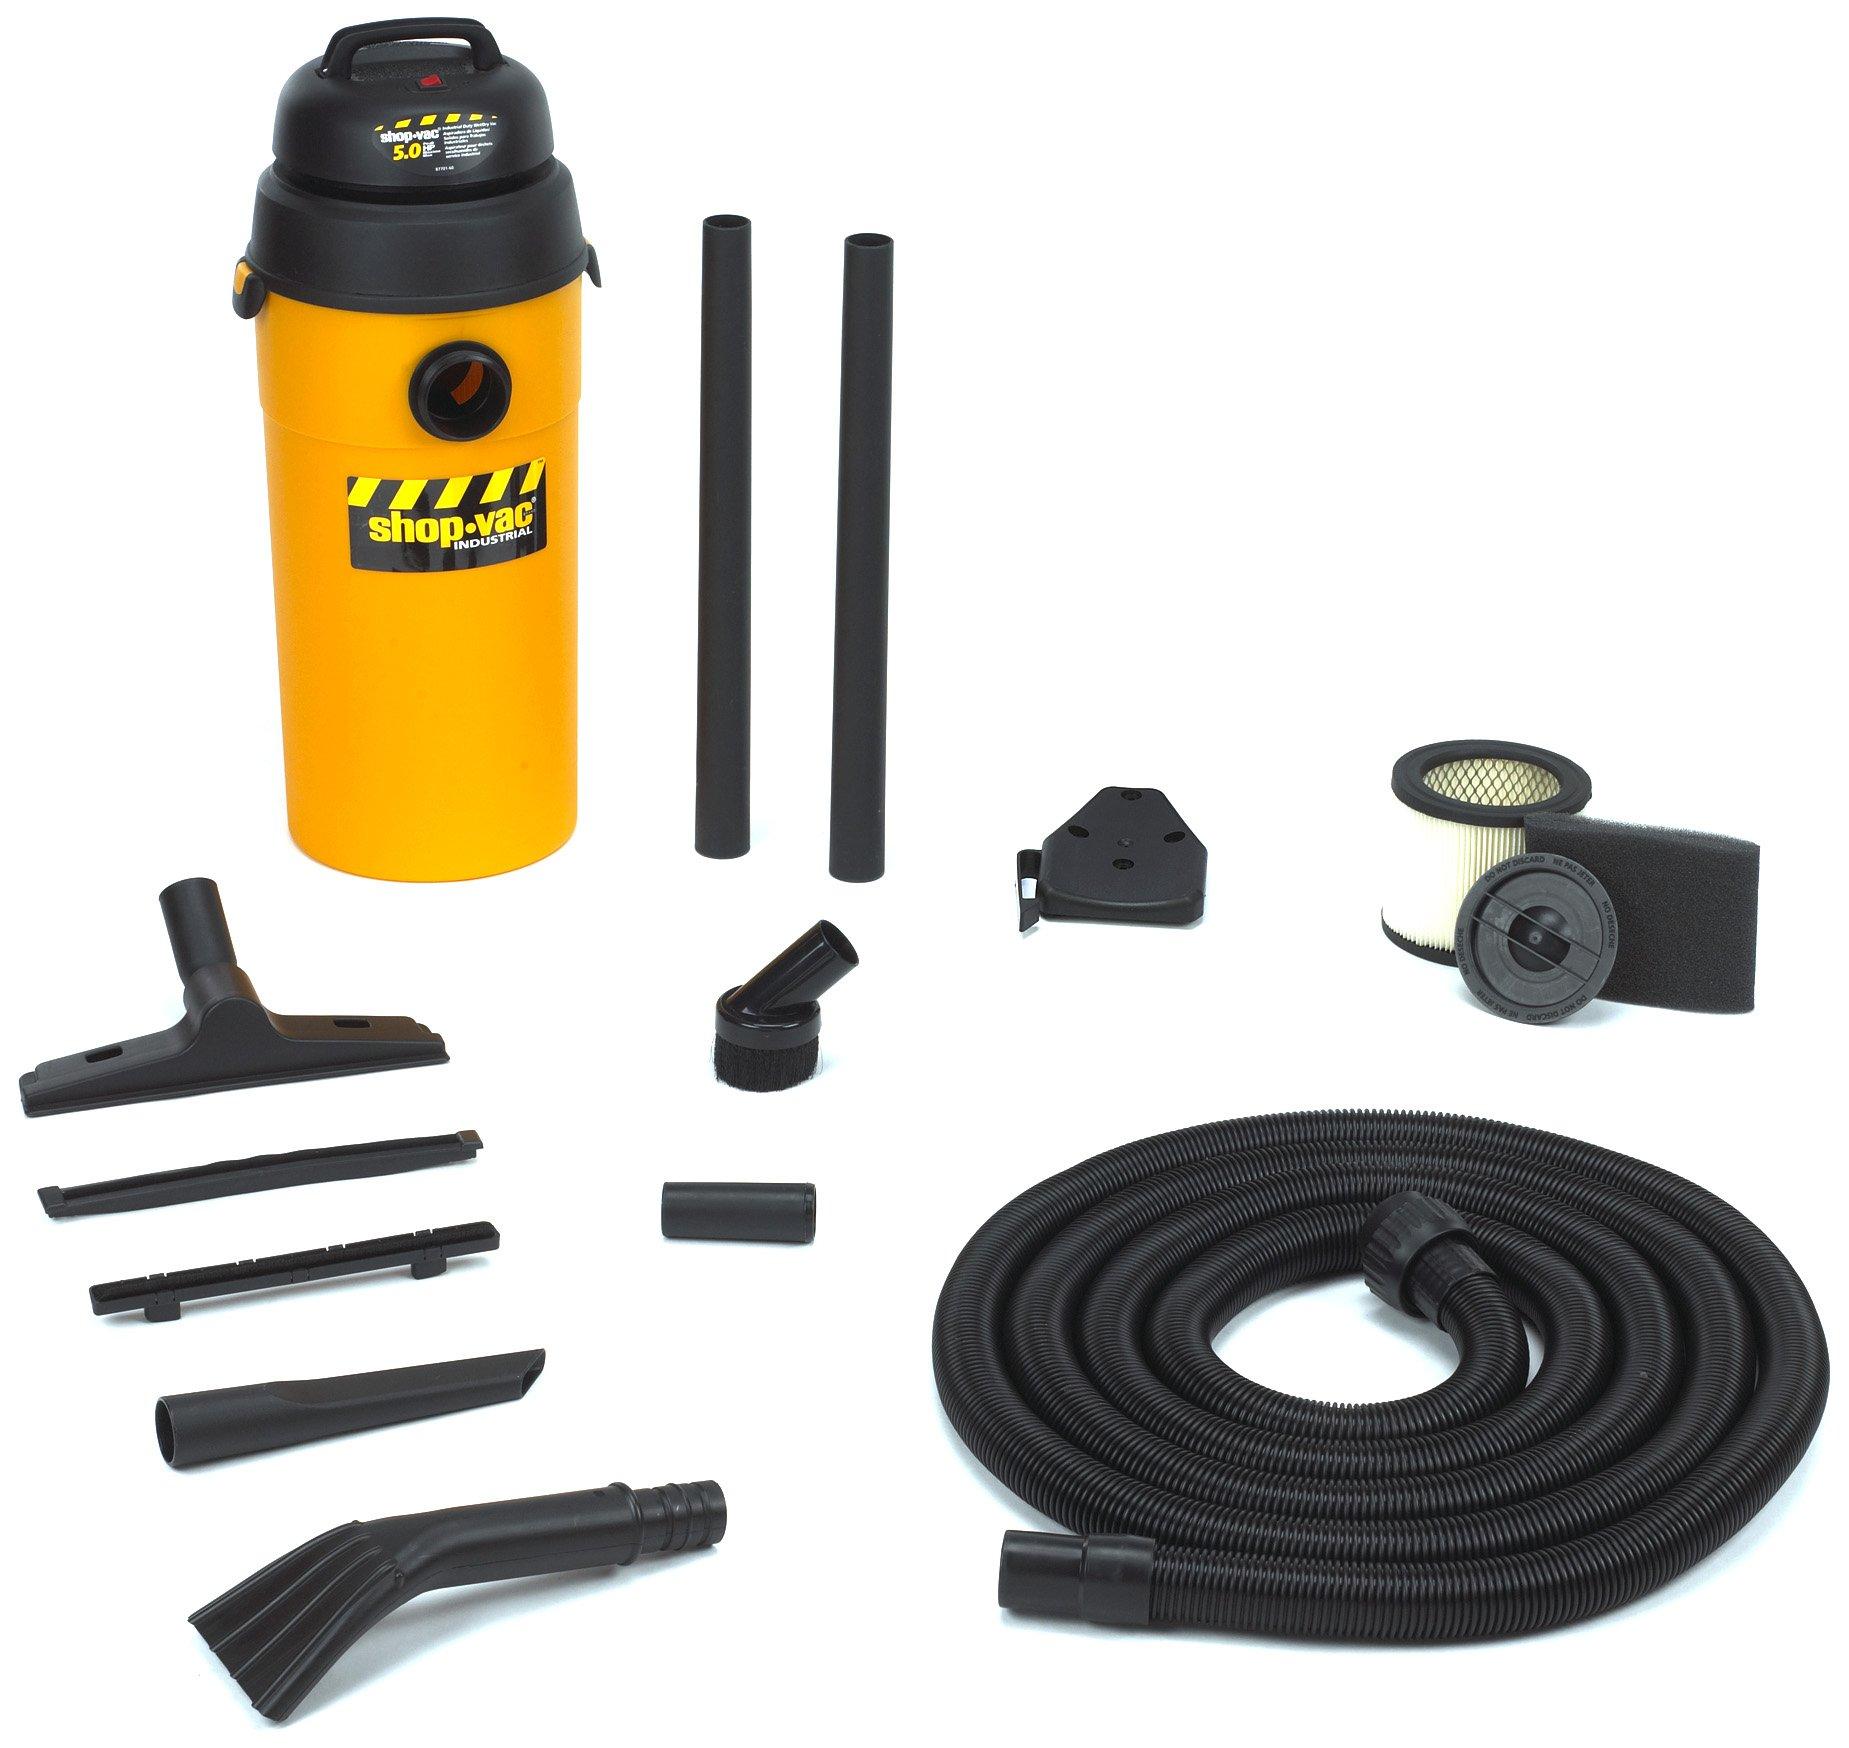 Shop-Vac 9520210 5.0 Peak Horsepower HangUp Wet/Dry Vacuum, 5-Gallon